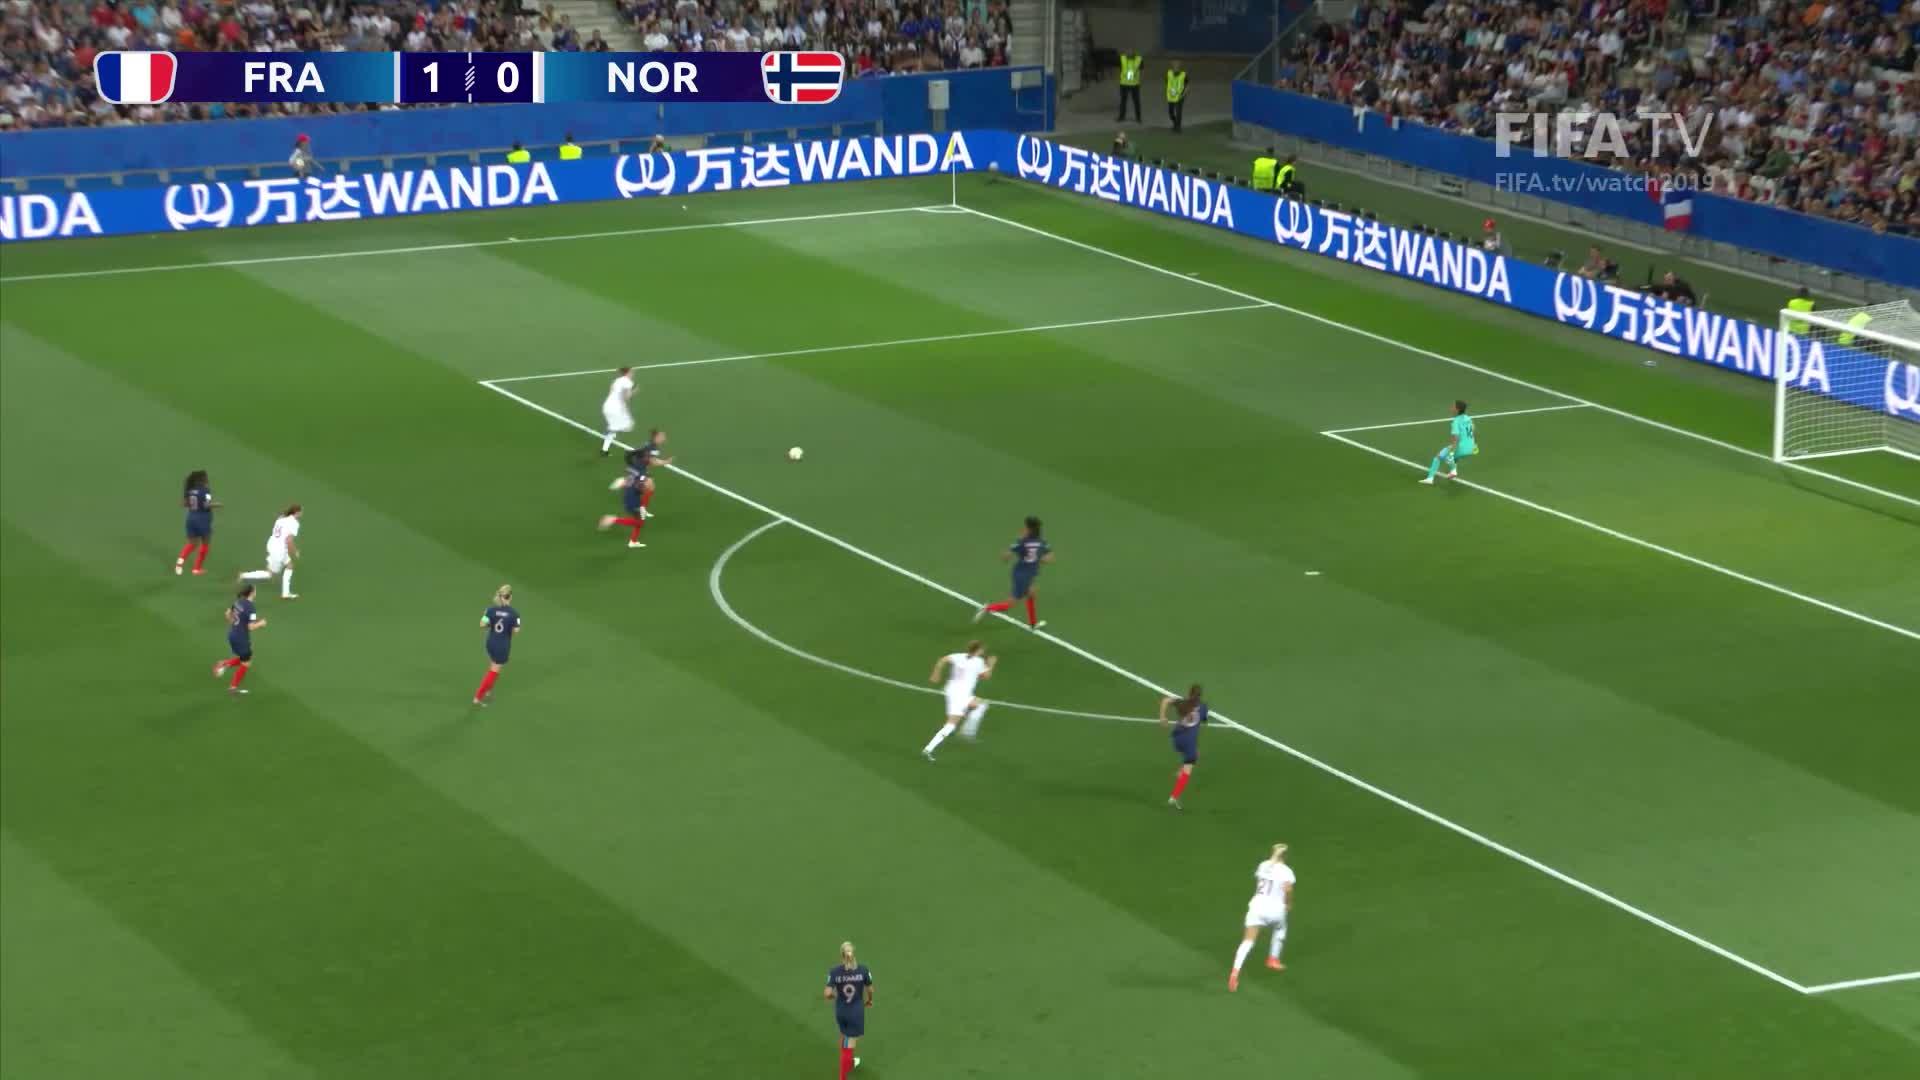 FIFA, FIFA Women's World Cup, FIFA Women's World Cup France 2019, FIFATV, Football, France, France 2019, Goals, Highlights, Match Highlights, Women's Football, Women's World Cup, World Cup, World Cup Highlights, sp:dt=2019-06-12T19:00:00Z, sp:li=wwc, sp:st=soccer, sp:ti:away=NOR, sp:ti:home=FRA, sp:ty=high, France v Norway - FIFA Women's World Cup France 2019™ GIFs